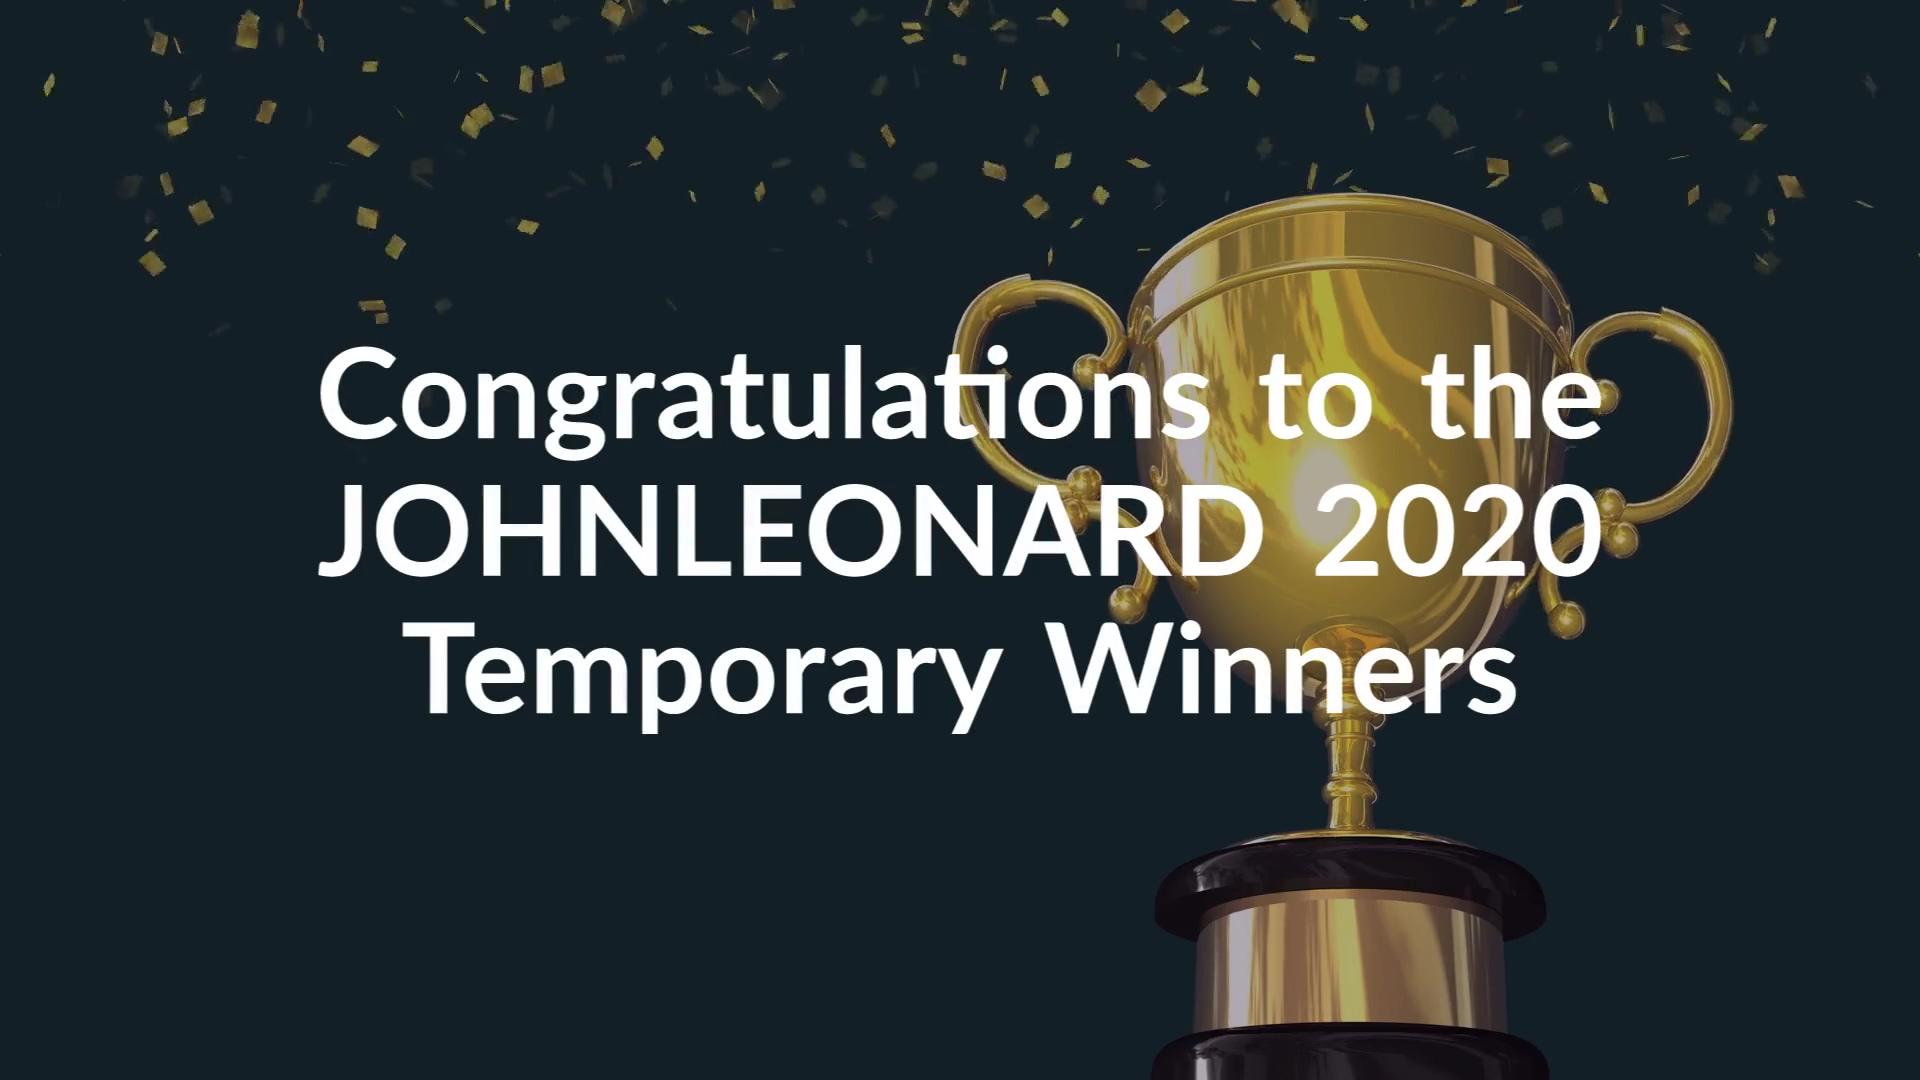 temp-winner-video-2020 (1)